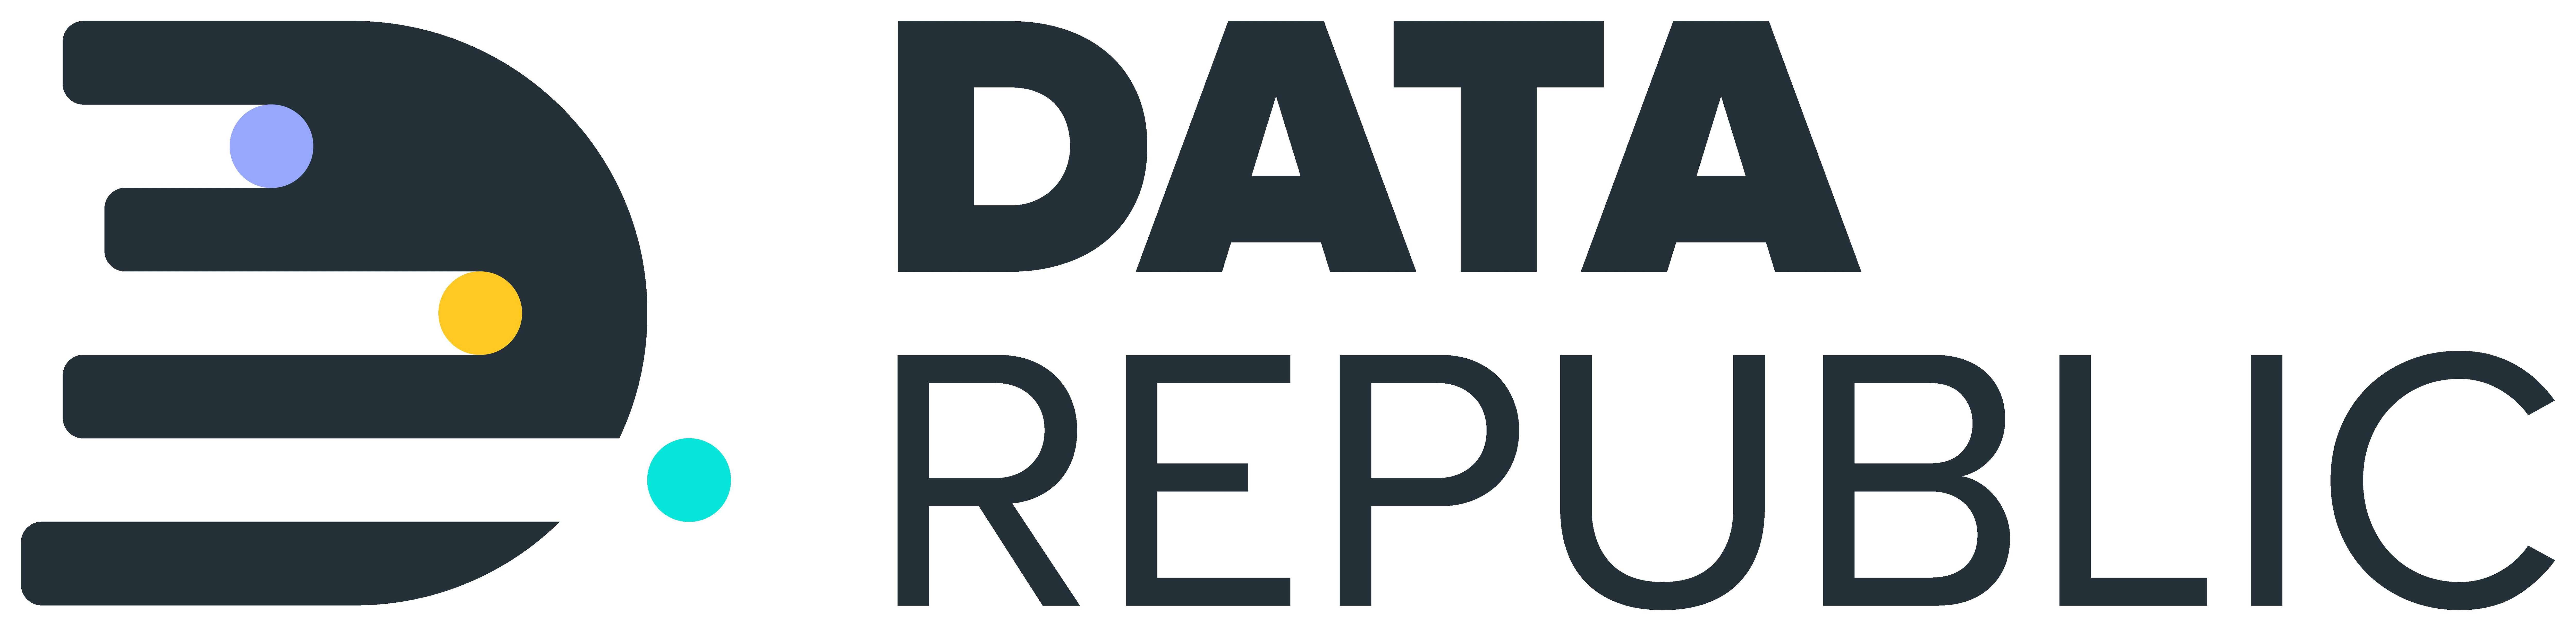 Data Republic Pty Ltd logo